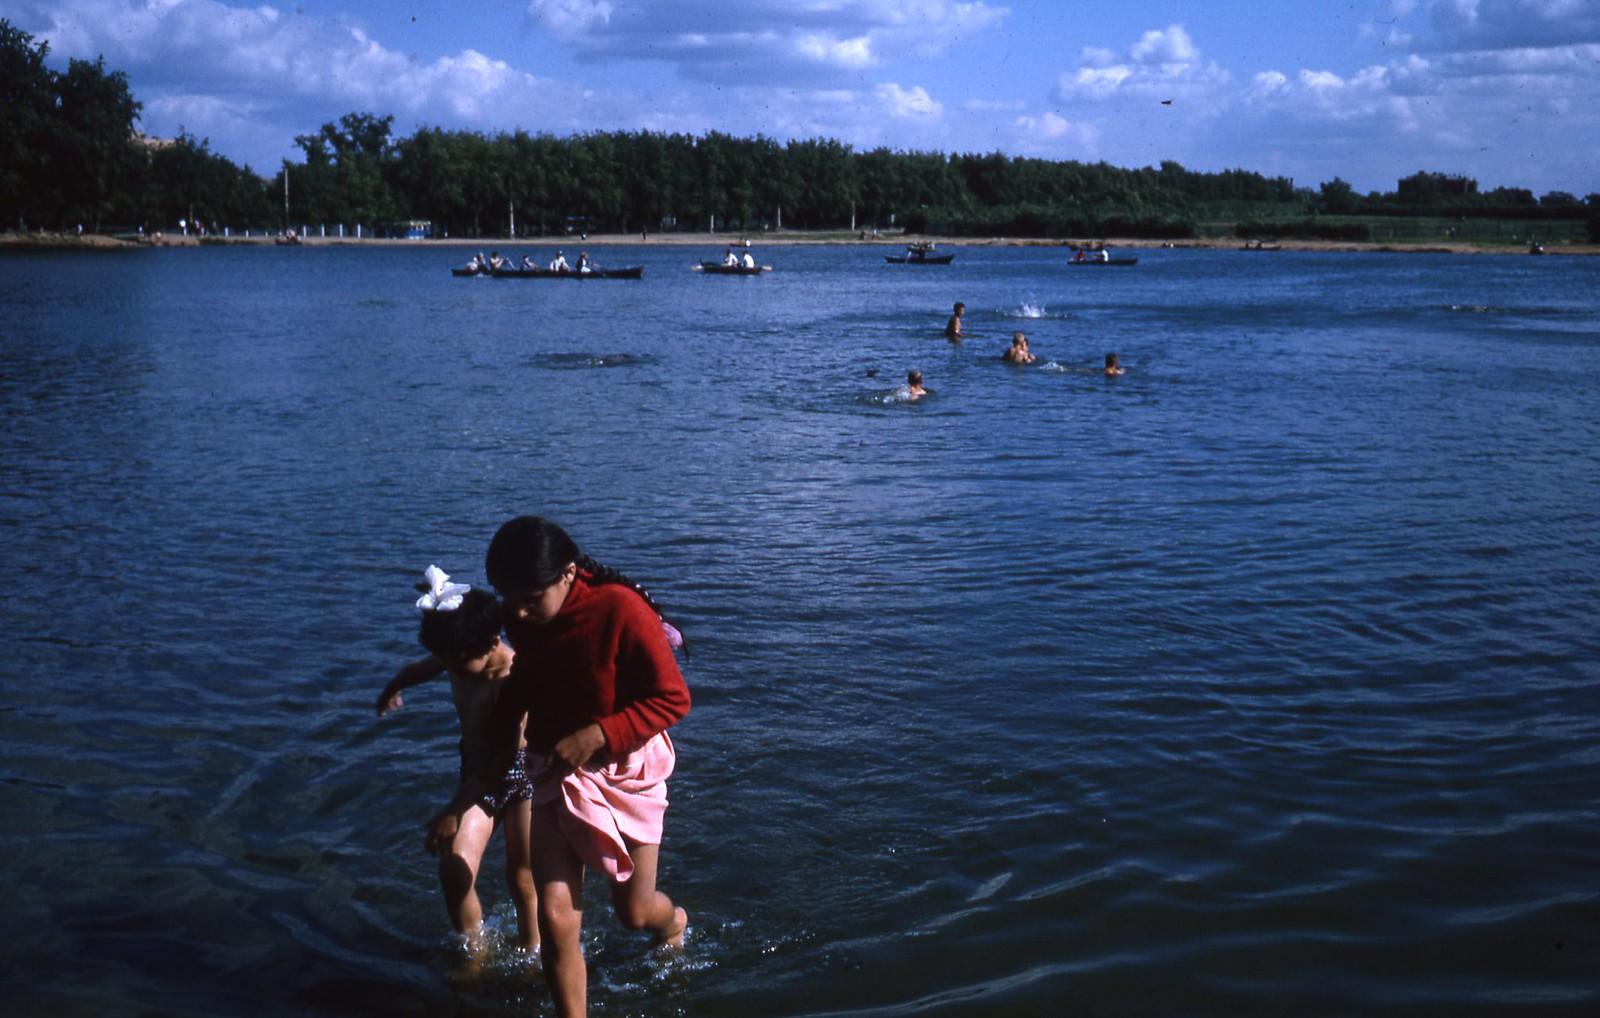 hammond-MA10-Ostankino-people-sunbathing-and-fishing-014